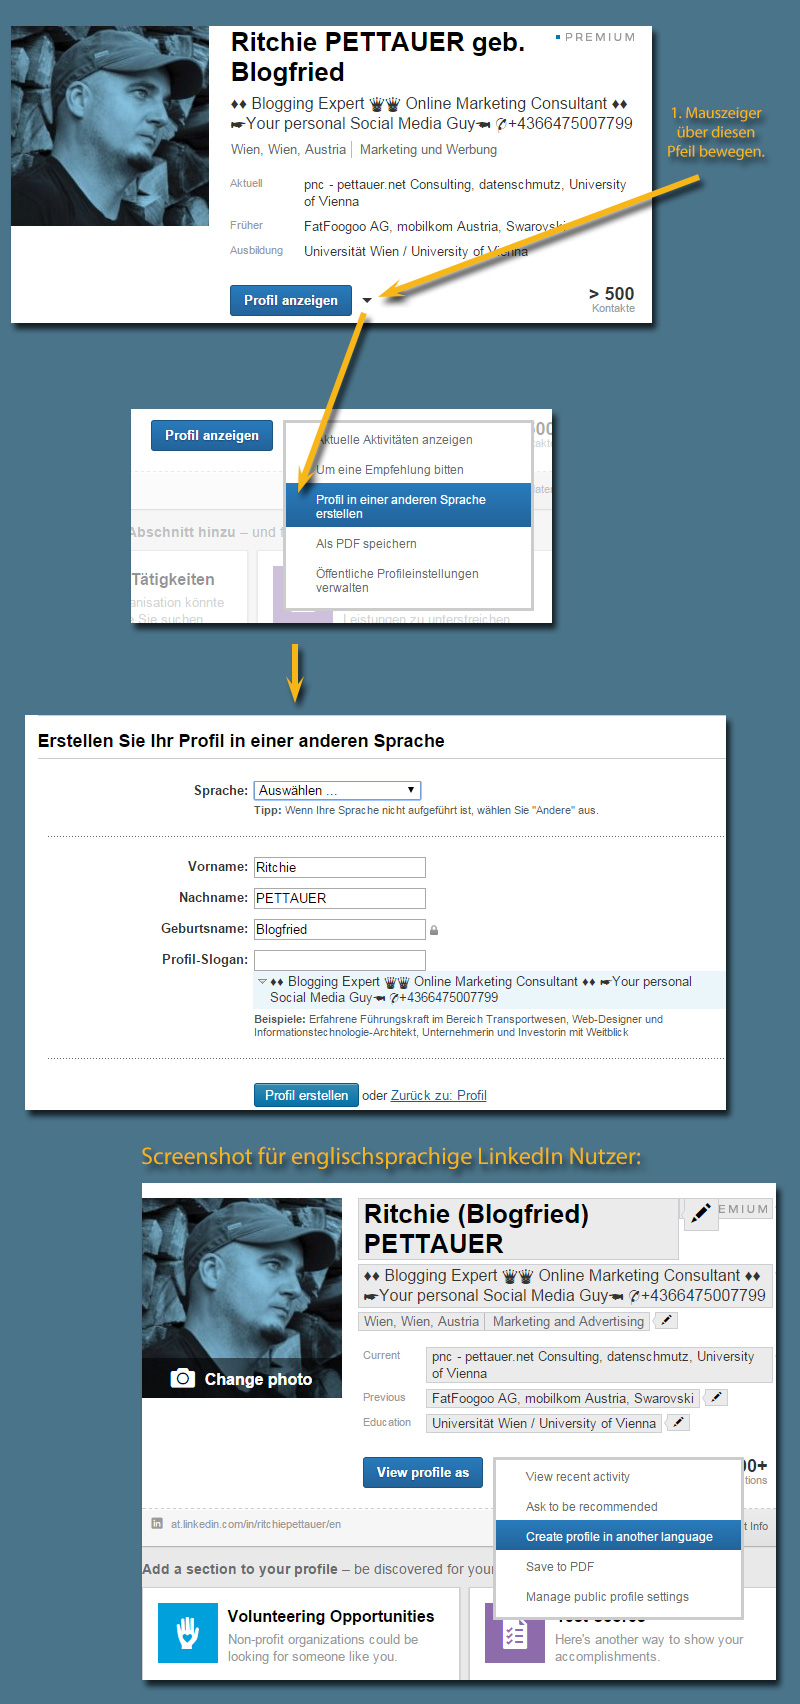 LinkedIn: Mehrsprachige Profile